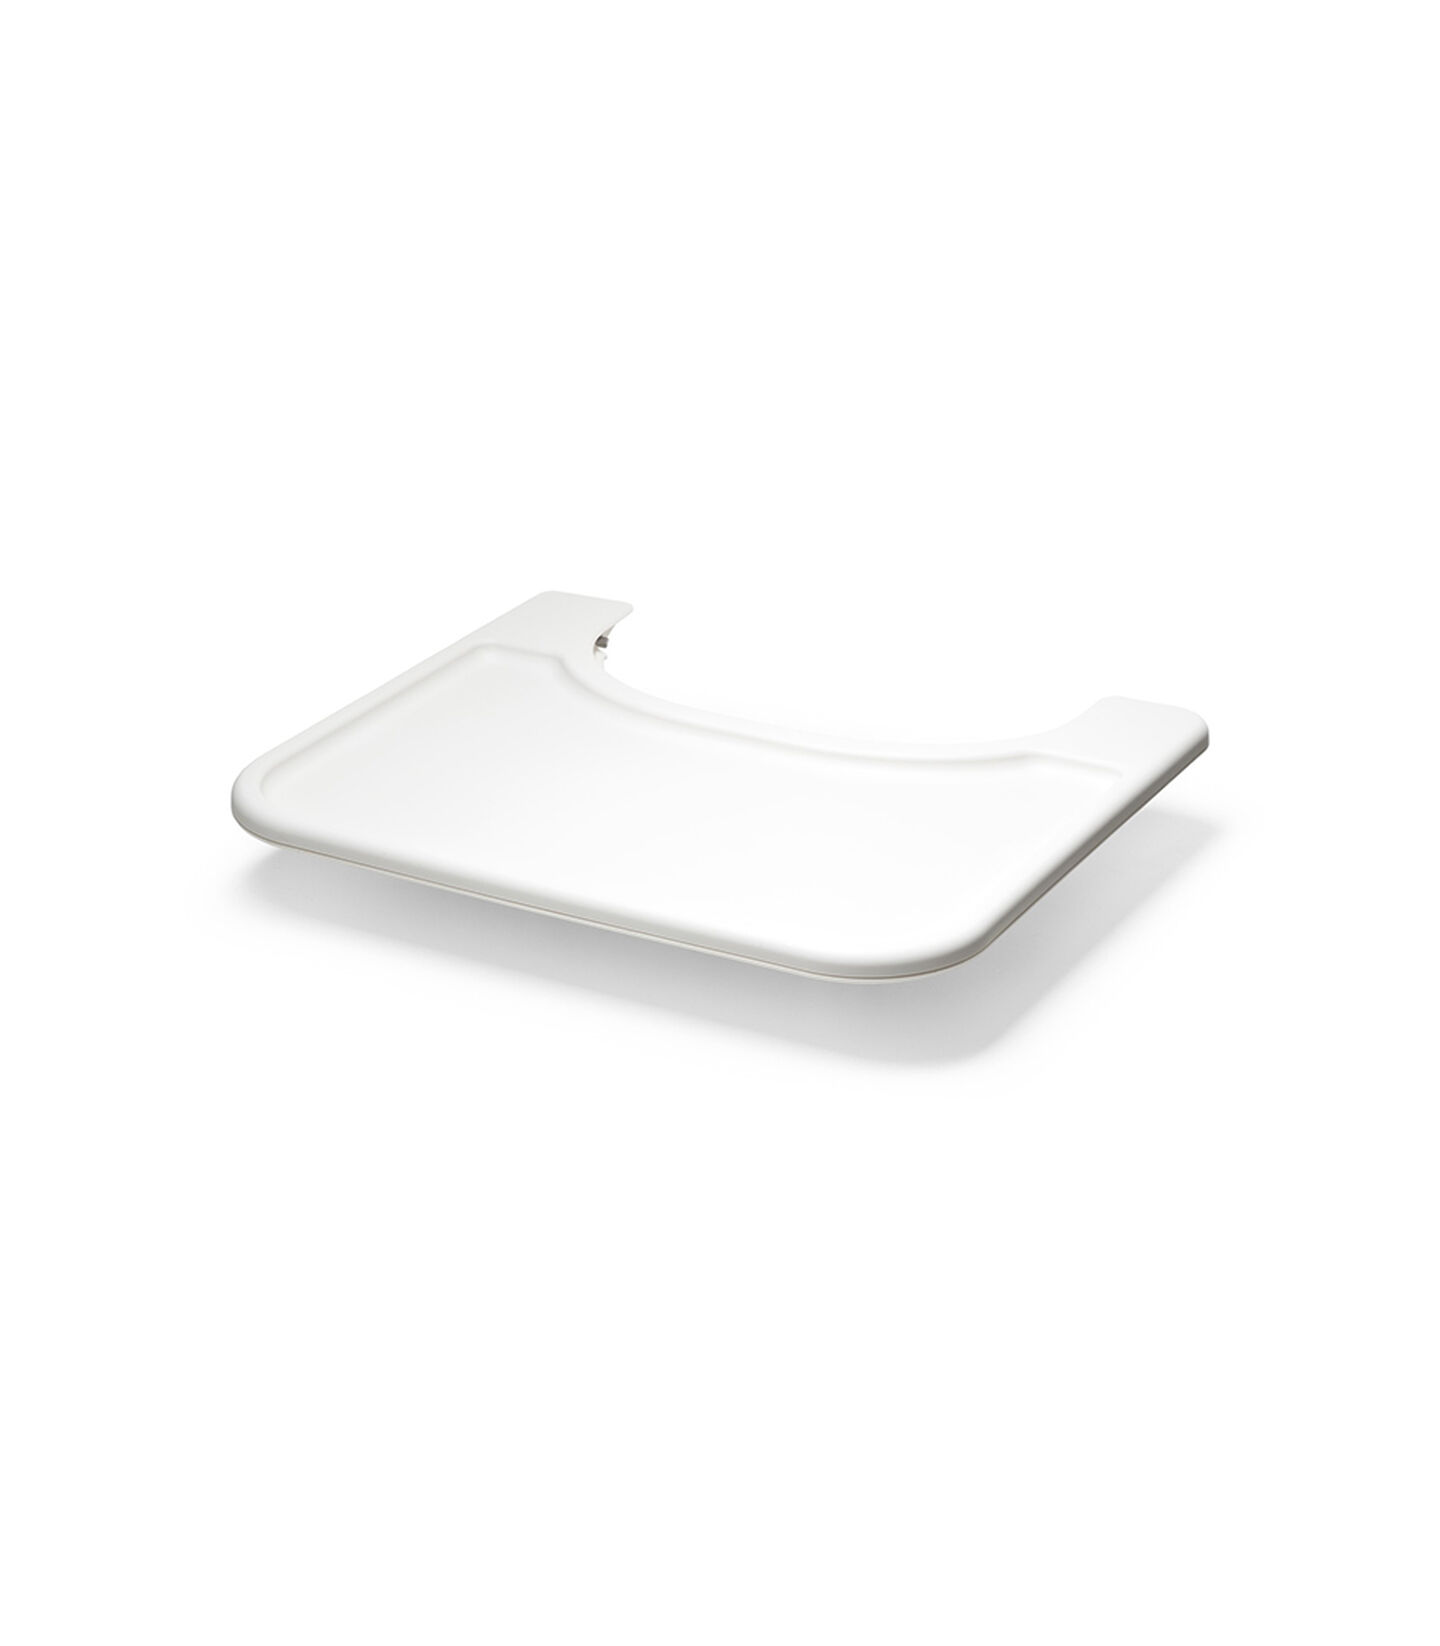 Stokke® Steps™ Baby Set Tray White, White, mainview view 2